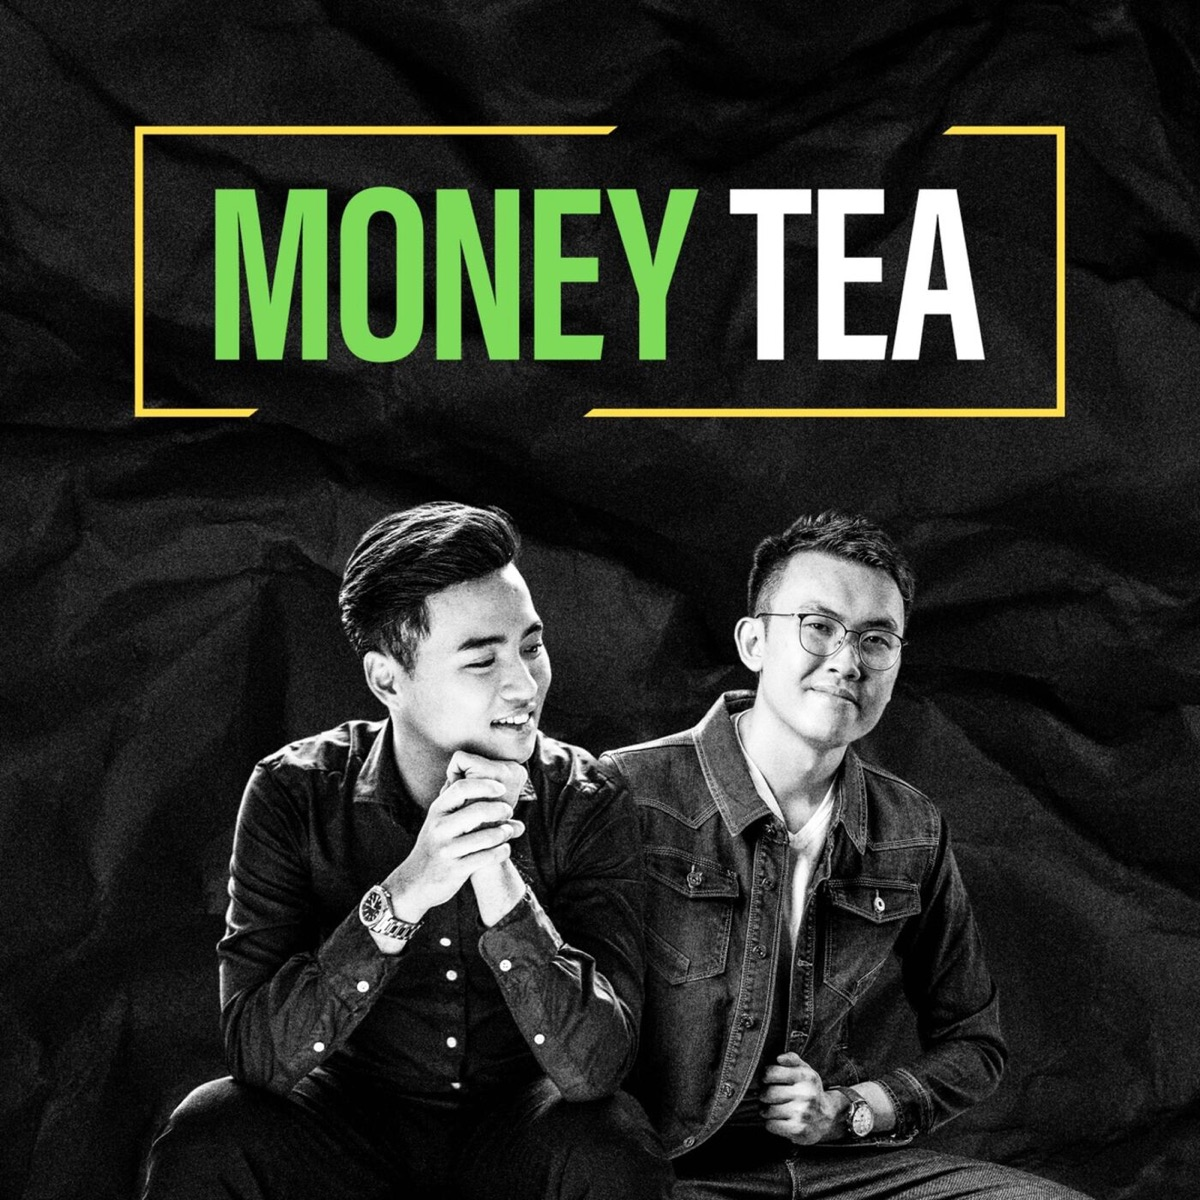 Money tea